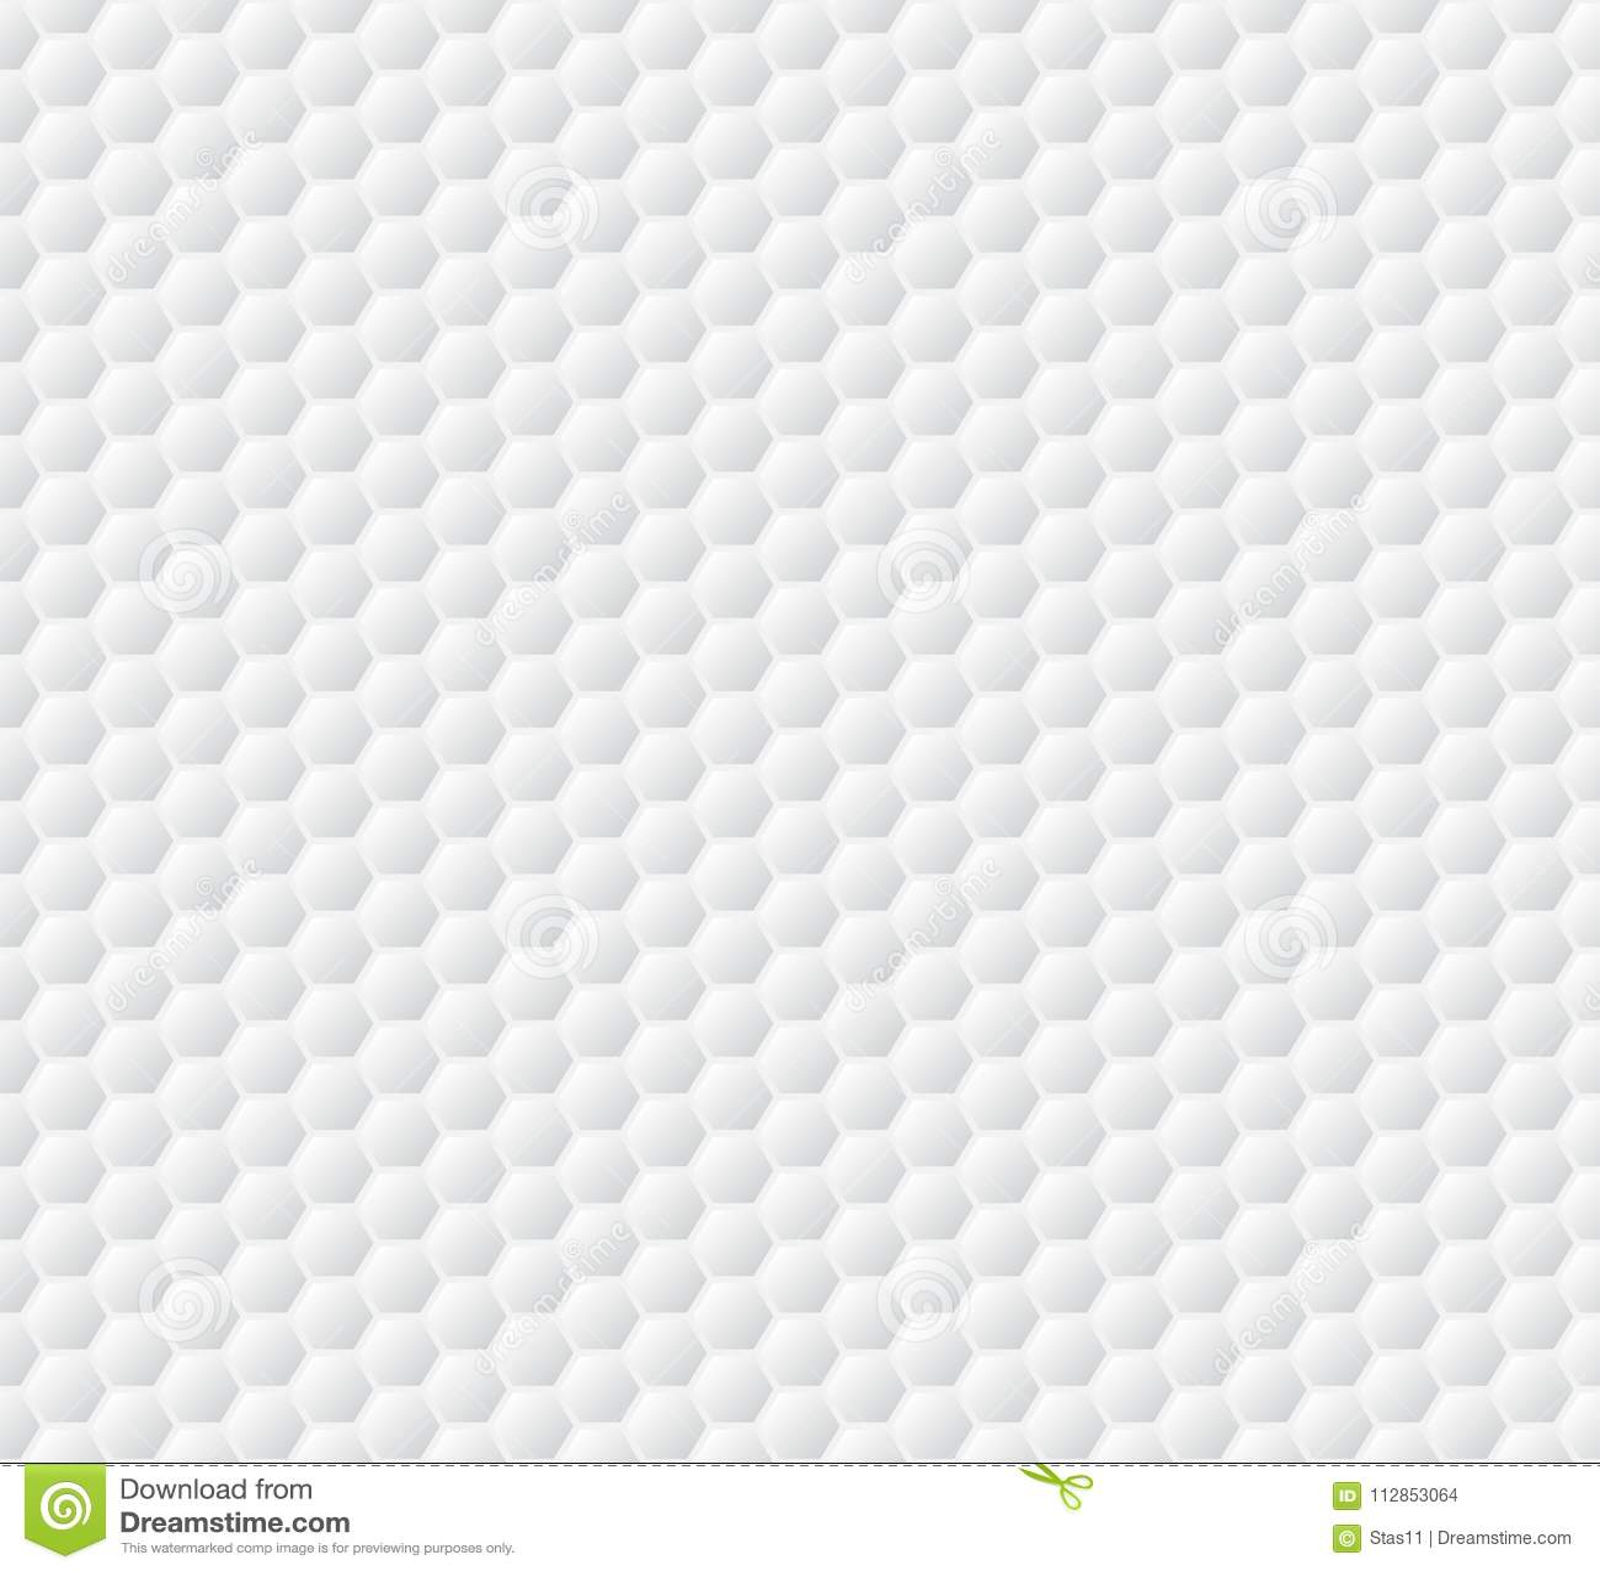 golf ball texture stock illustrations � 834 golf ball